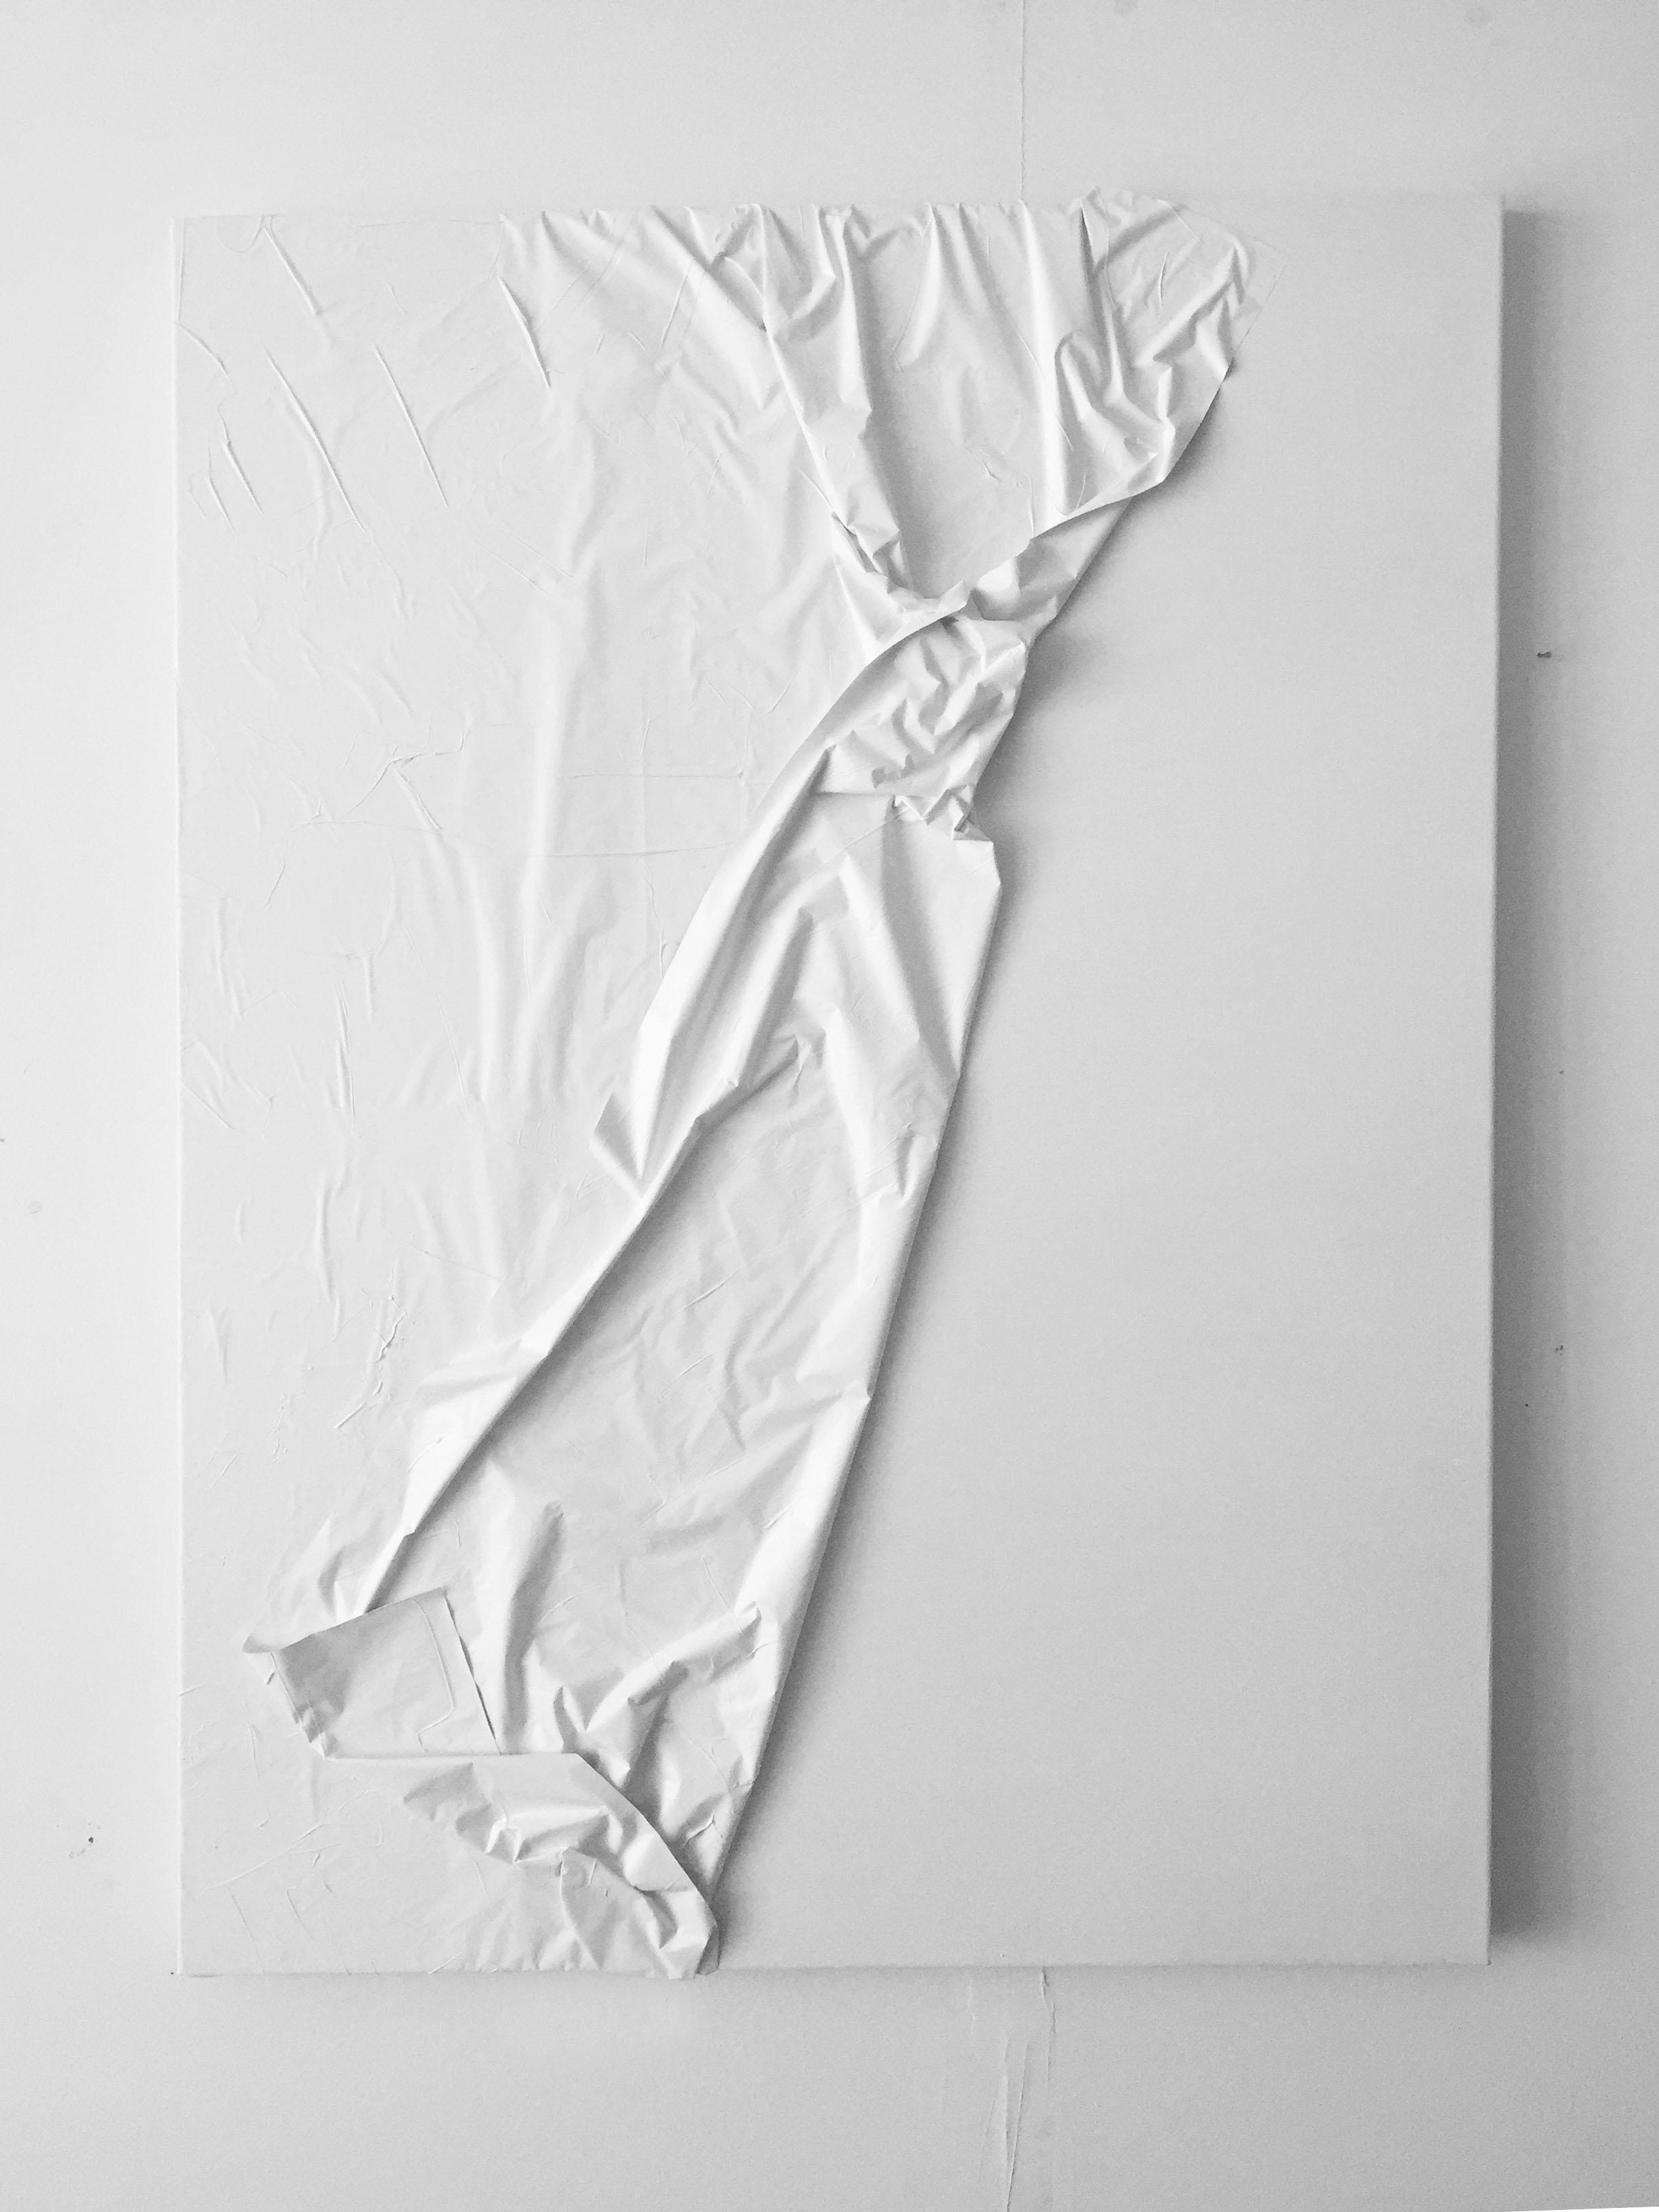 74' 11'' PW6 (Xii) AA Prueba de Leucofobia: Blanco sobre Blanco